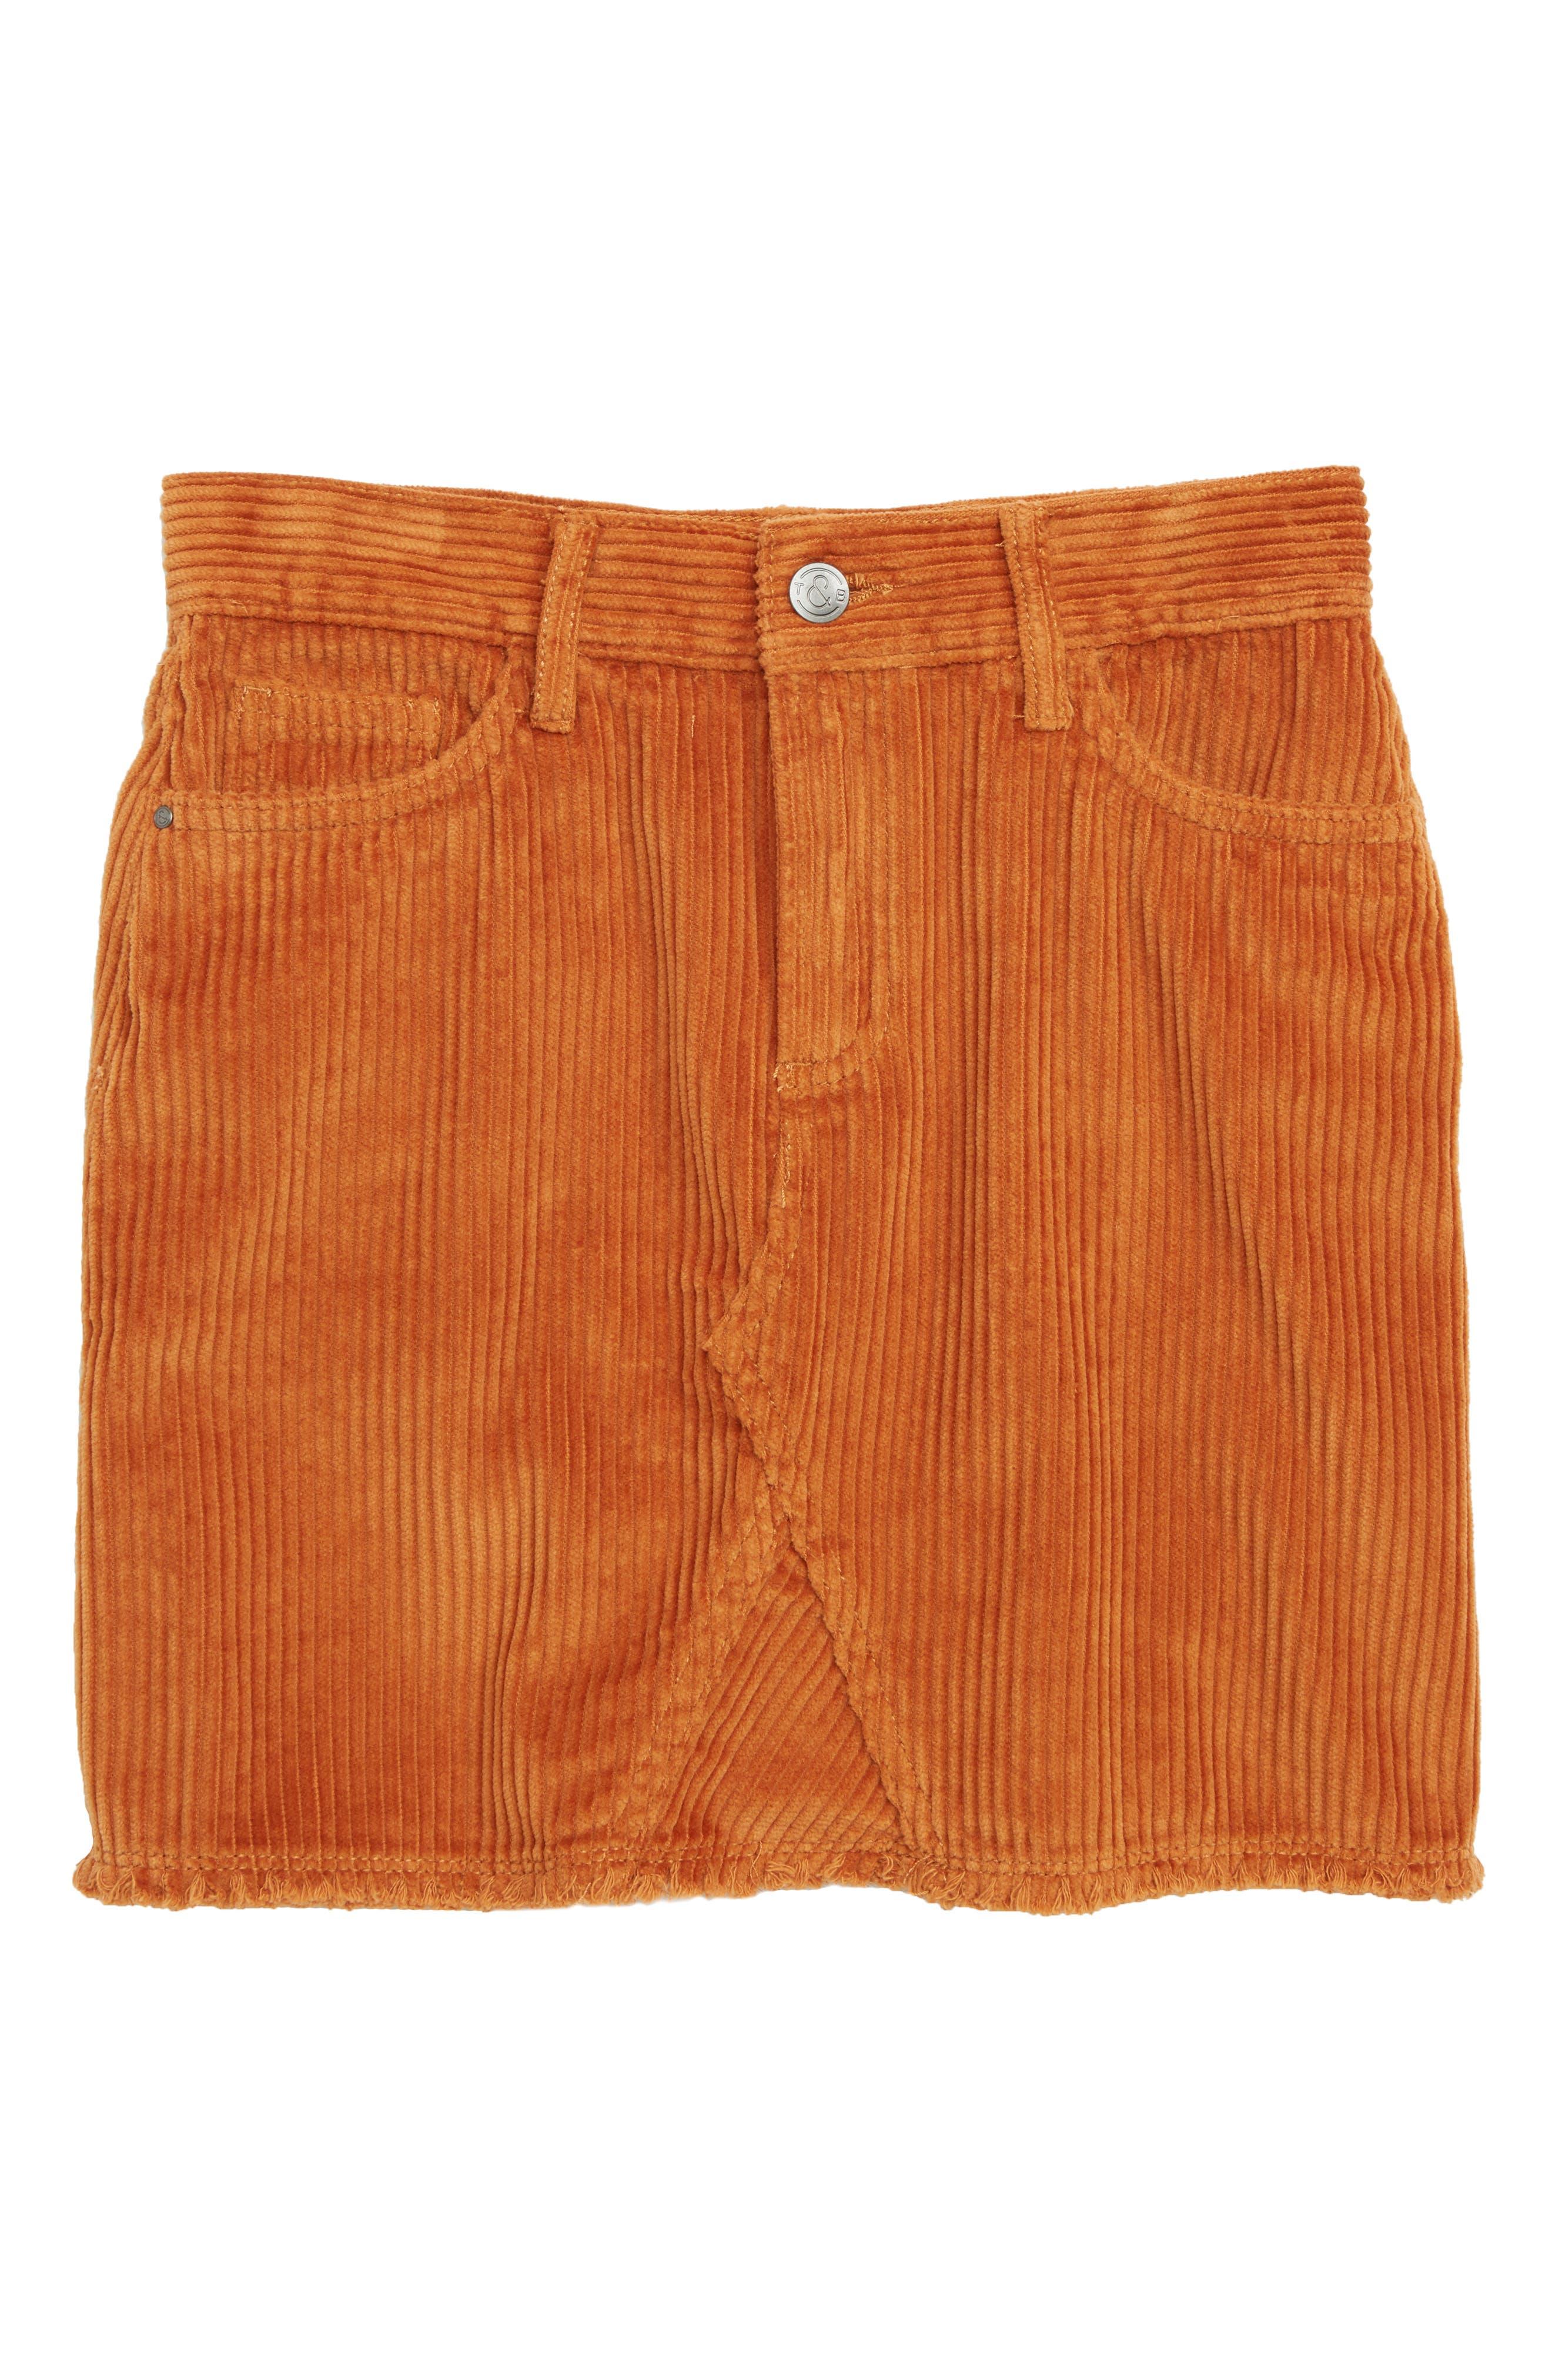 Corduroy Skirt,                             Main thumbnail 1, color,                             TAN ADOBE